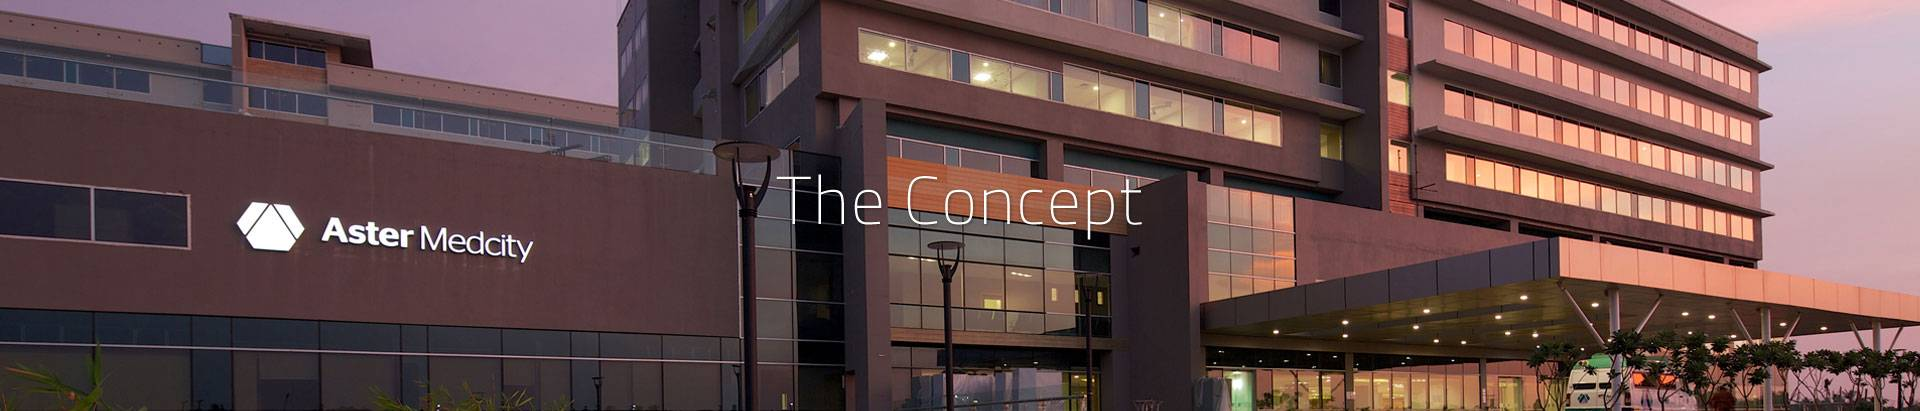 Slider-the-concept-01